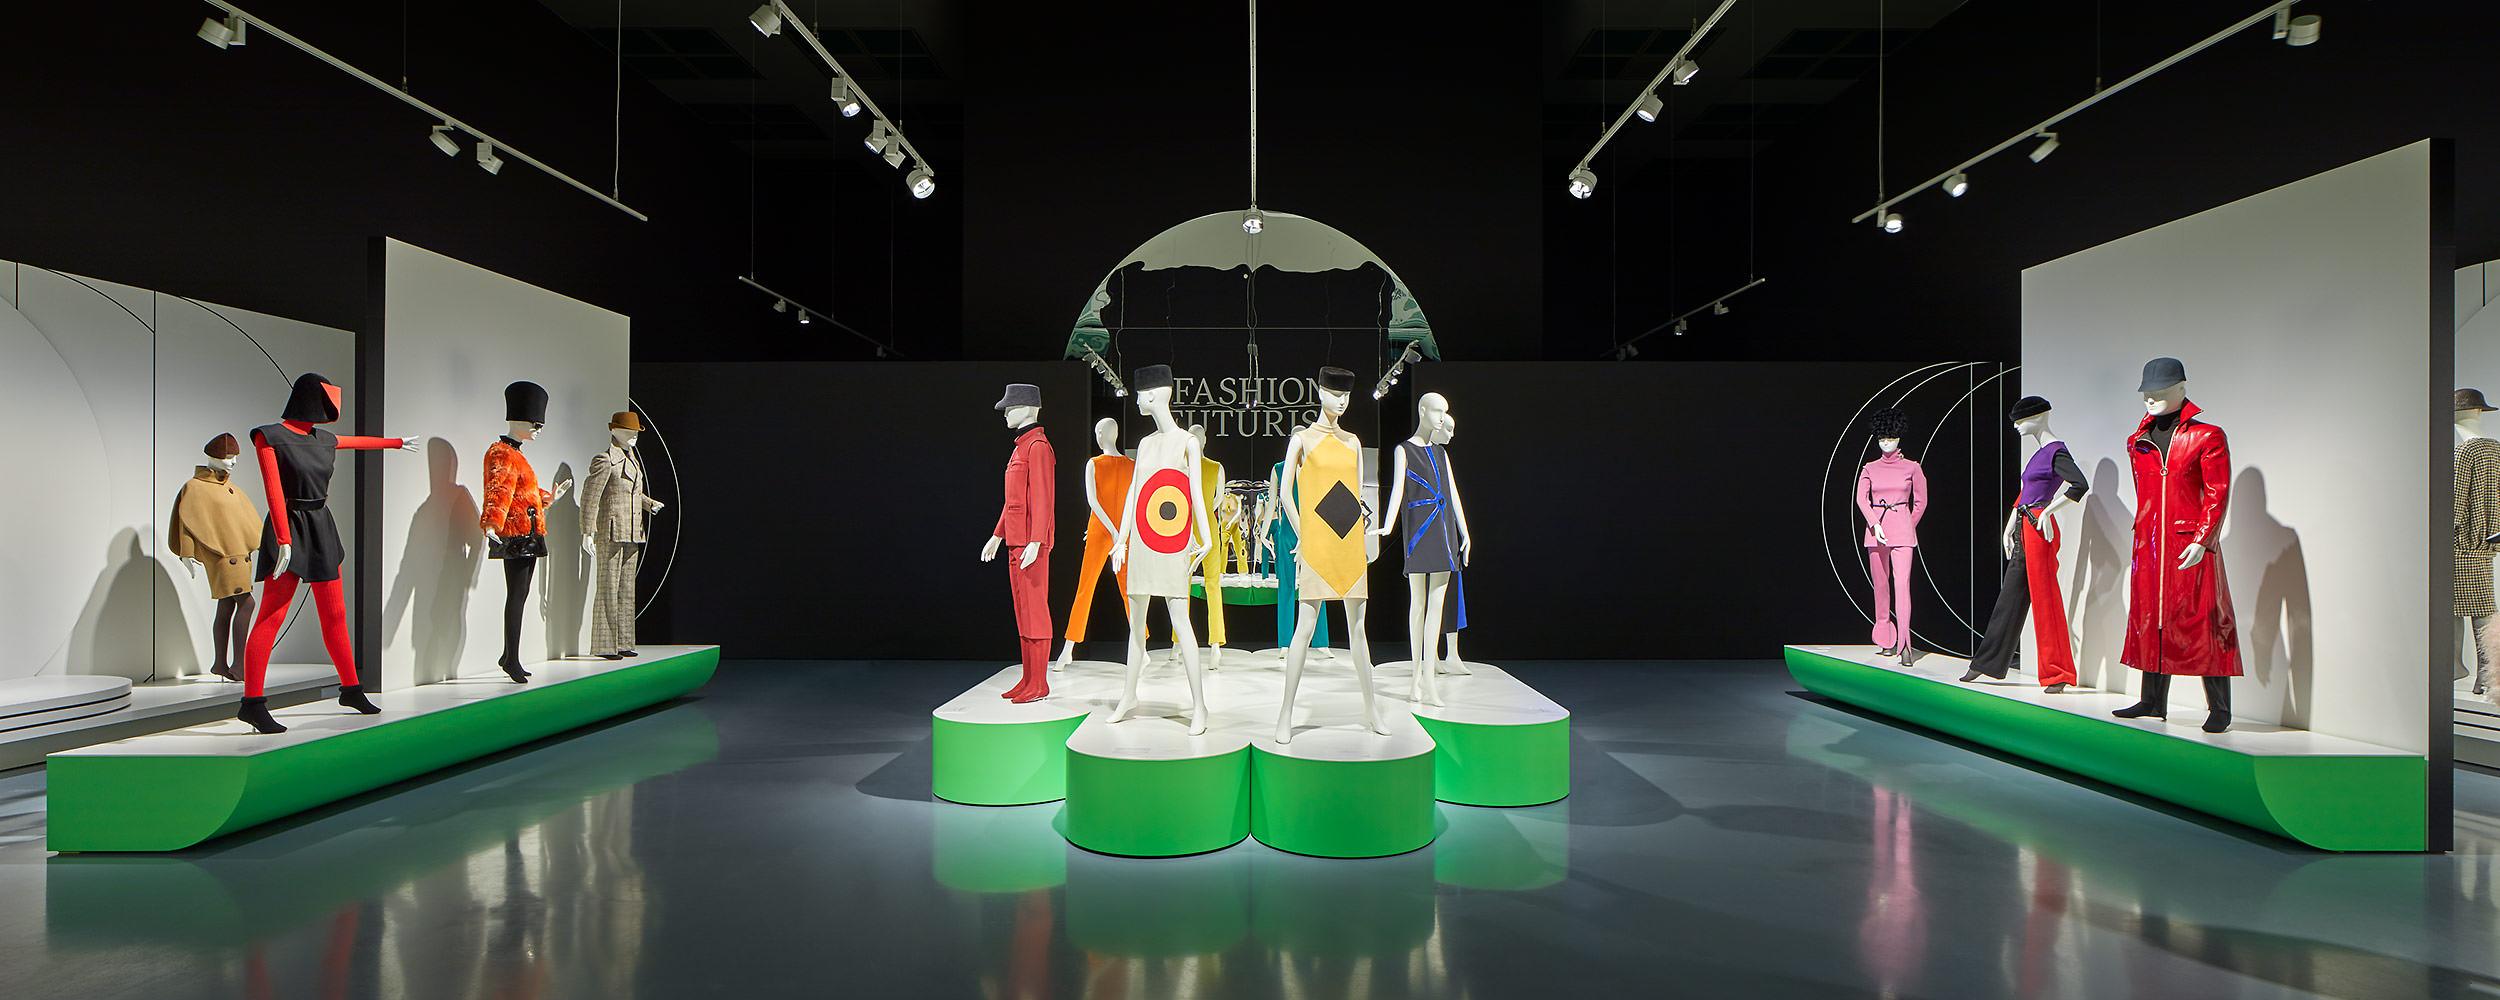 Architekturfotograf Düsseldorf, Pierre Cardin. Fashion Futurist, Donebyghosts, Kunstpalast, Düsseldorf